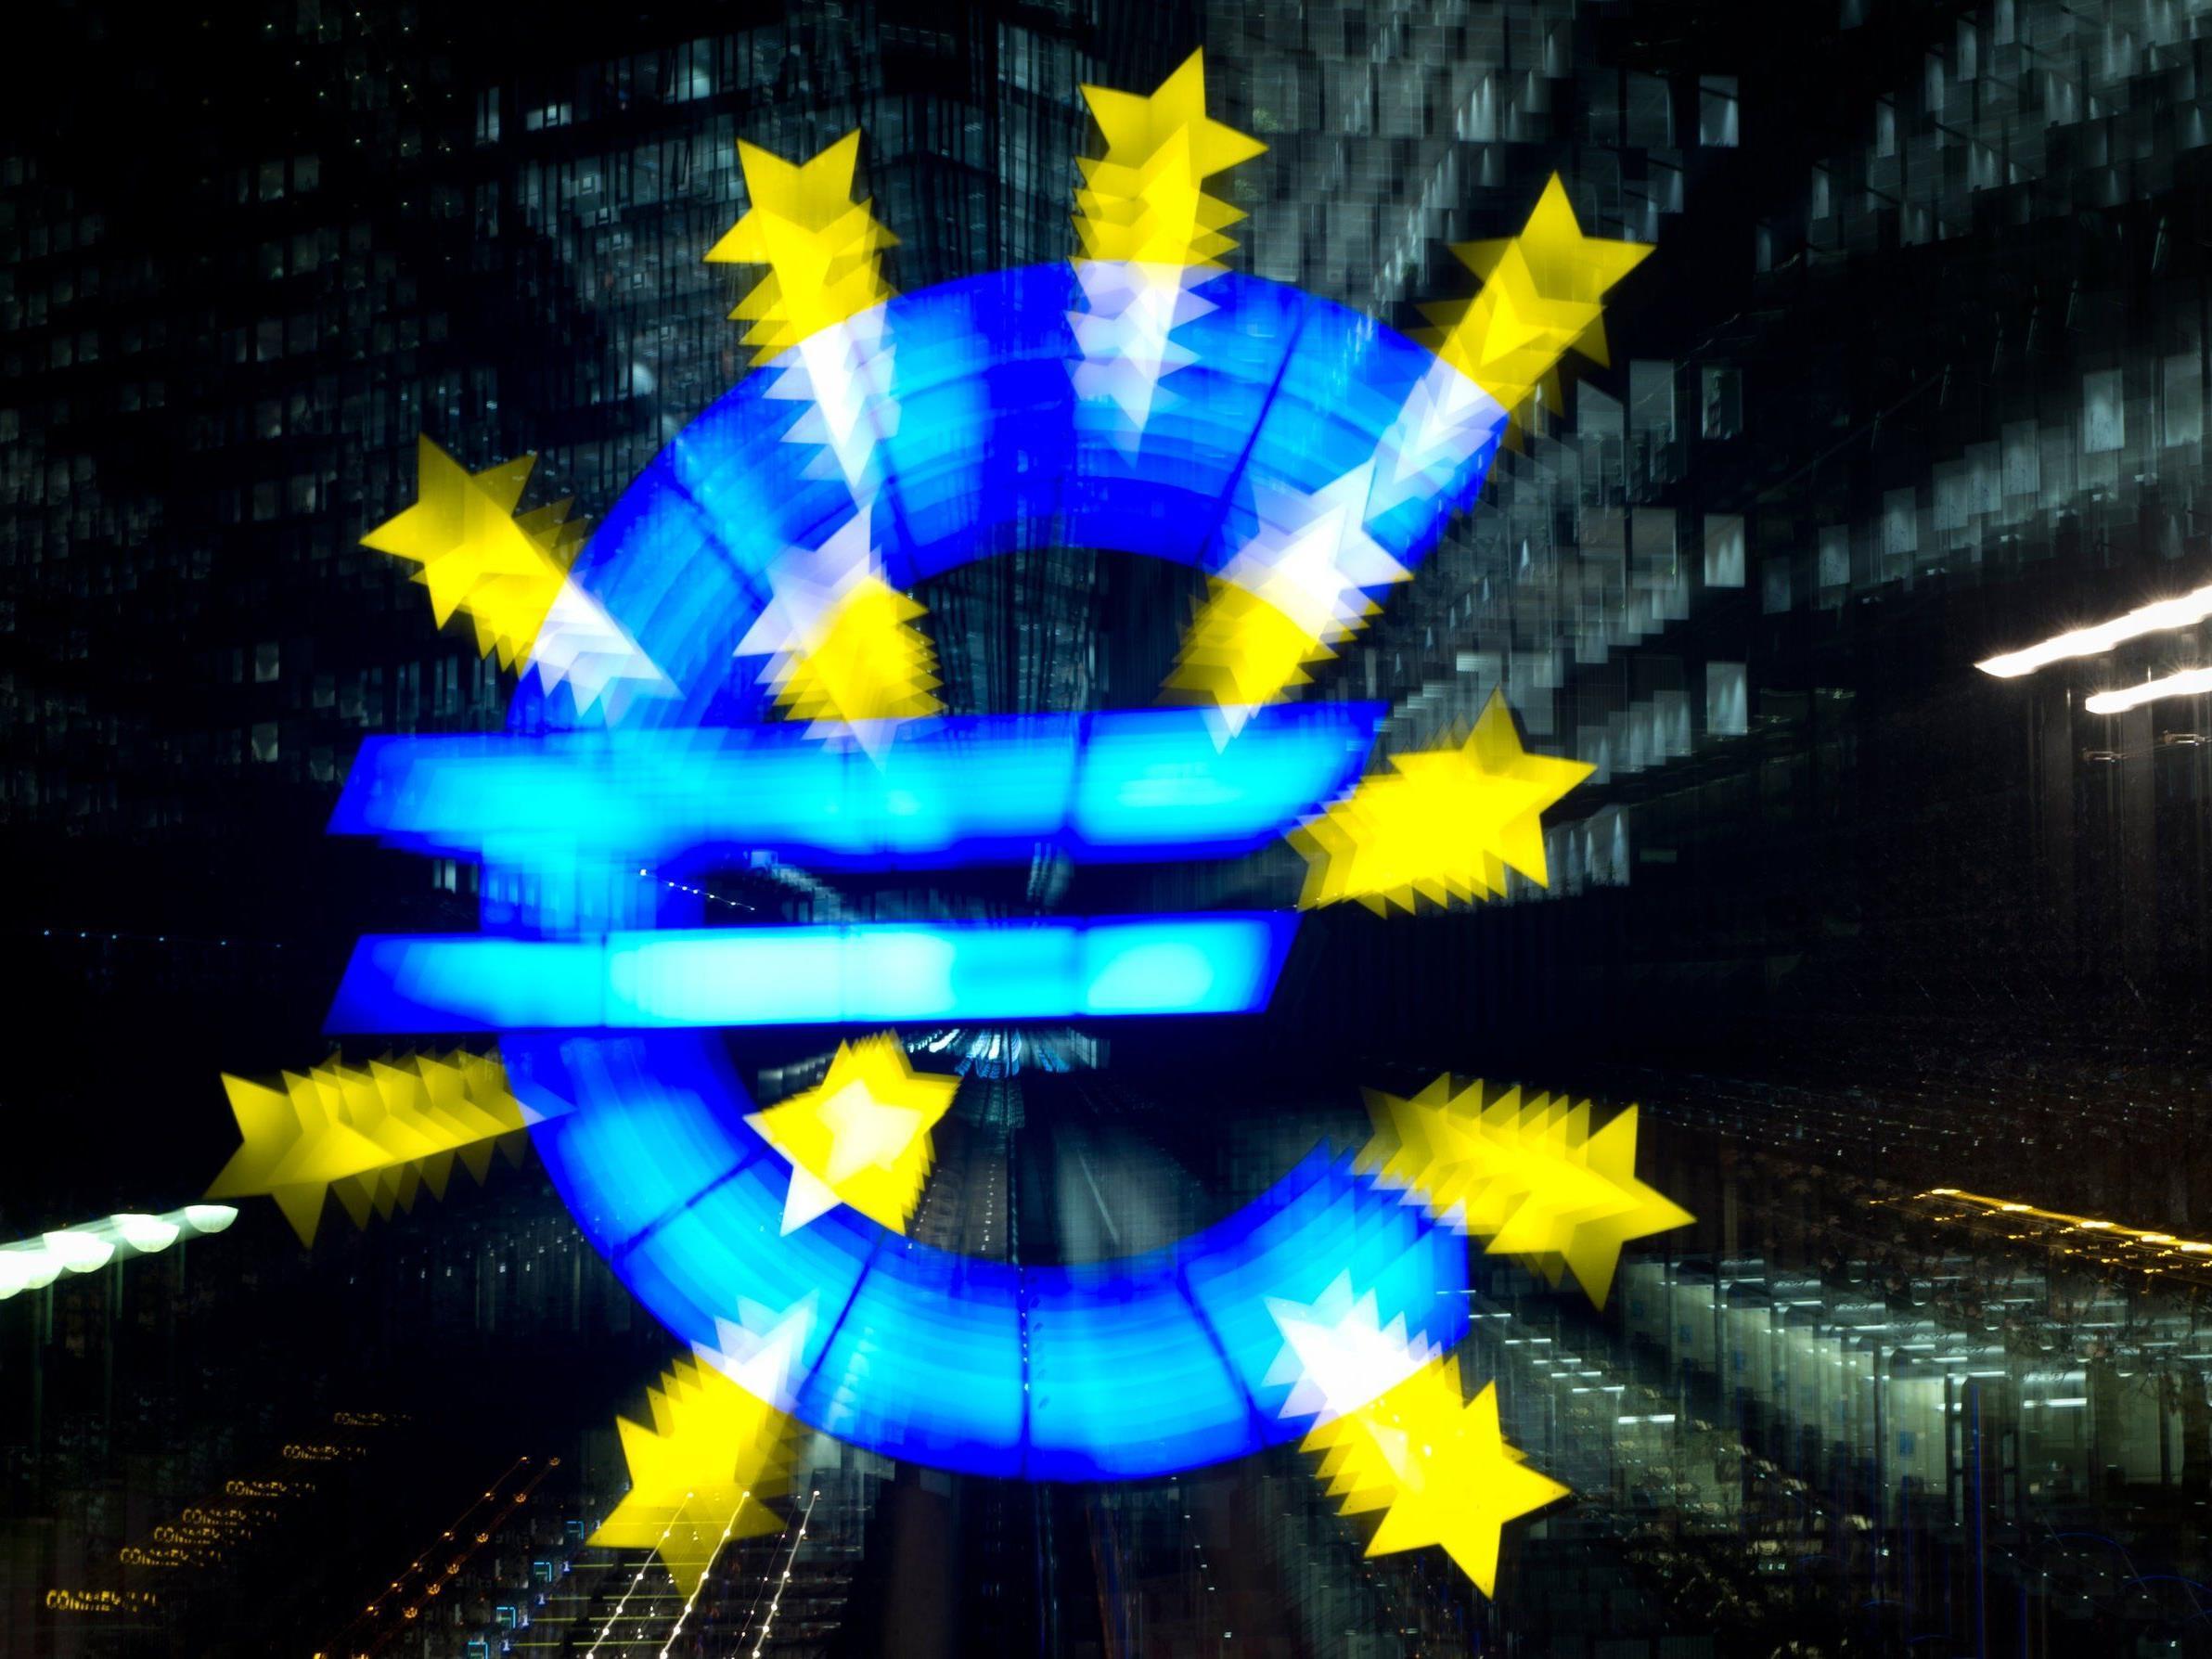 EZB legt neues Anti-Krisenpaket auf und schafft Leitzins quasi ab